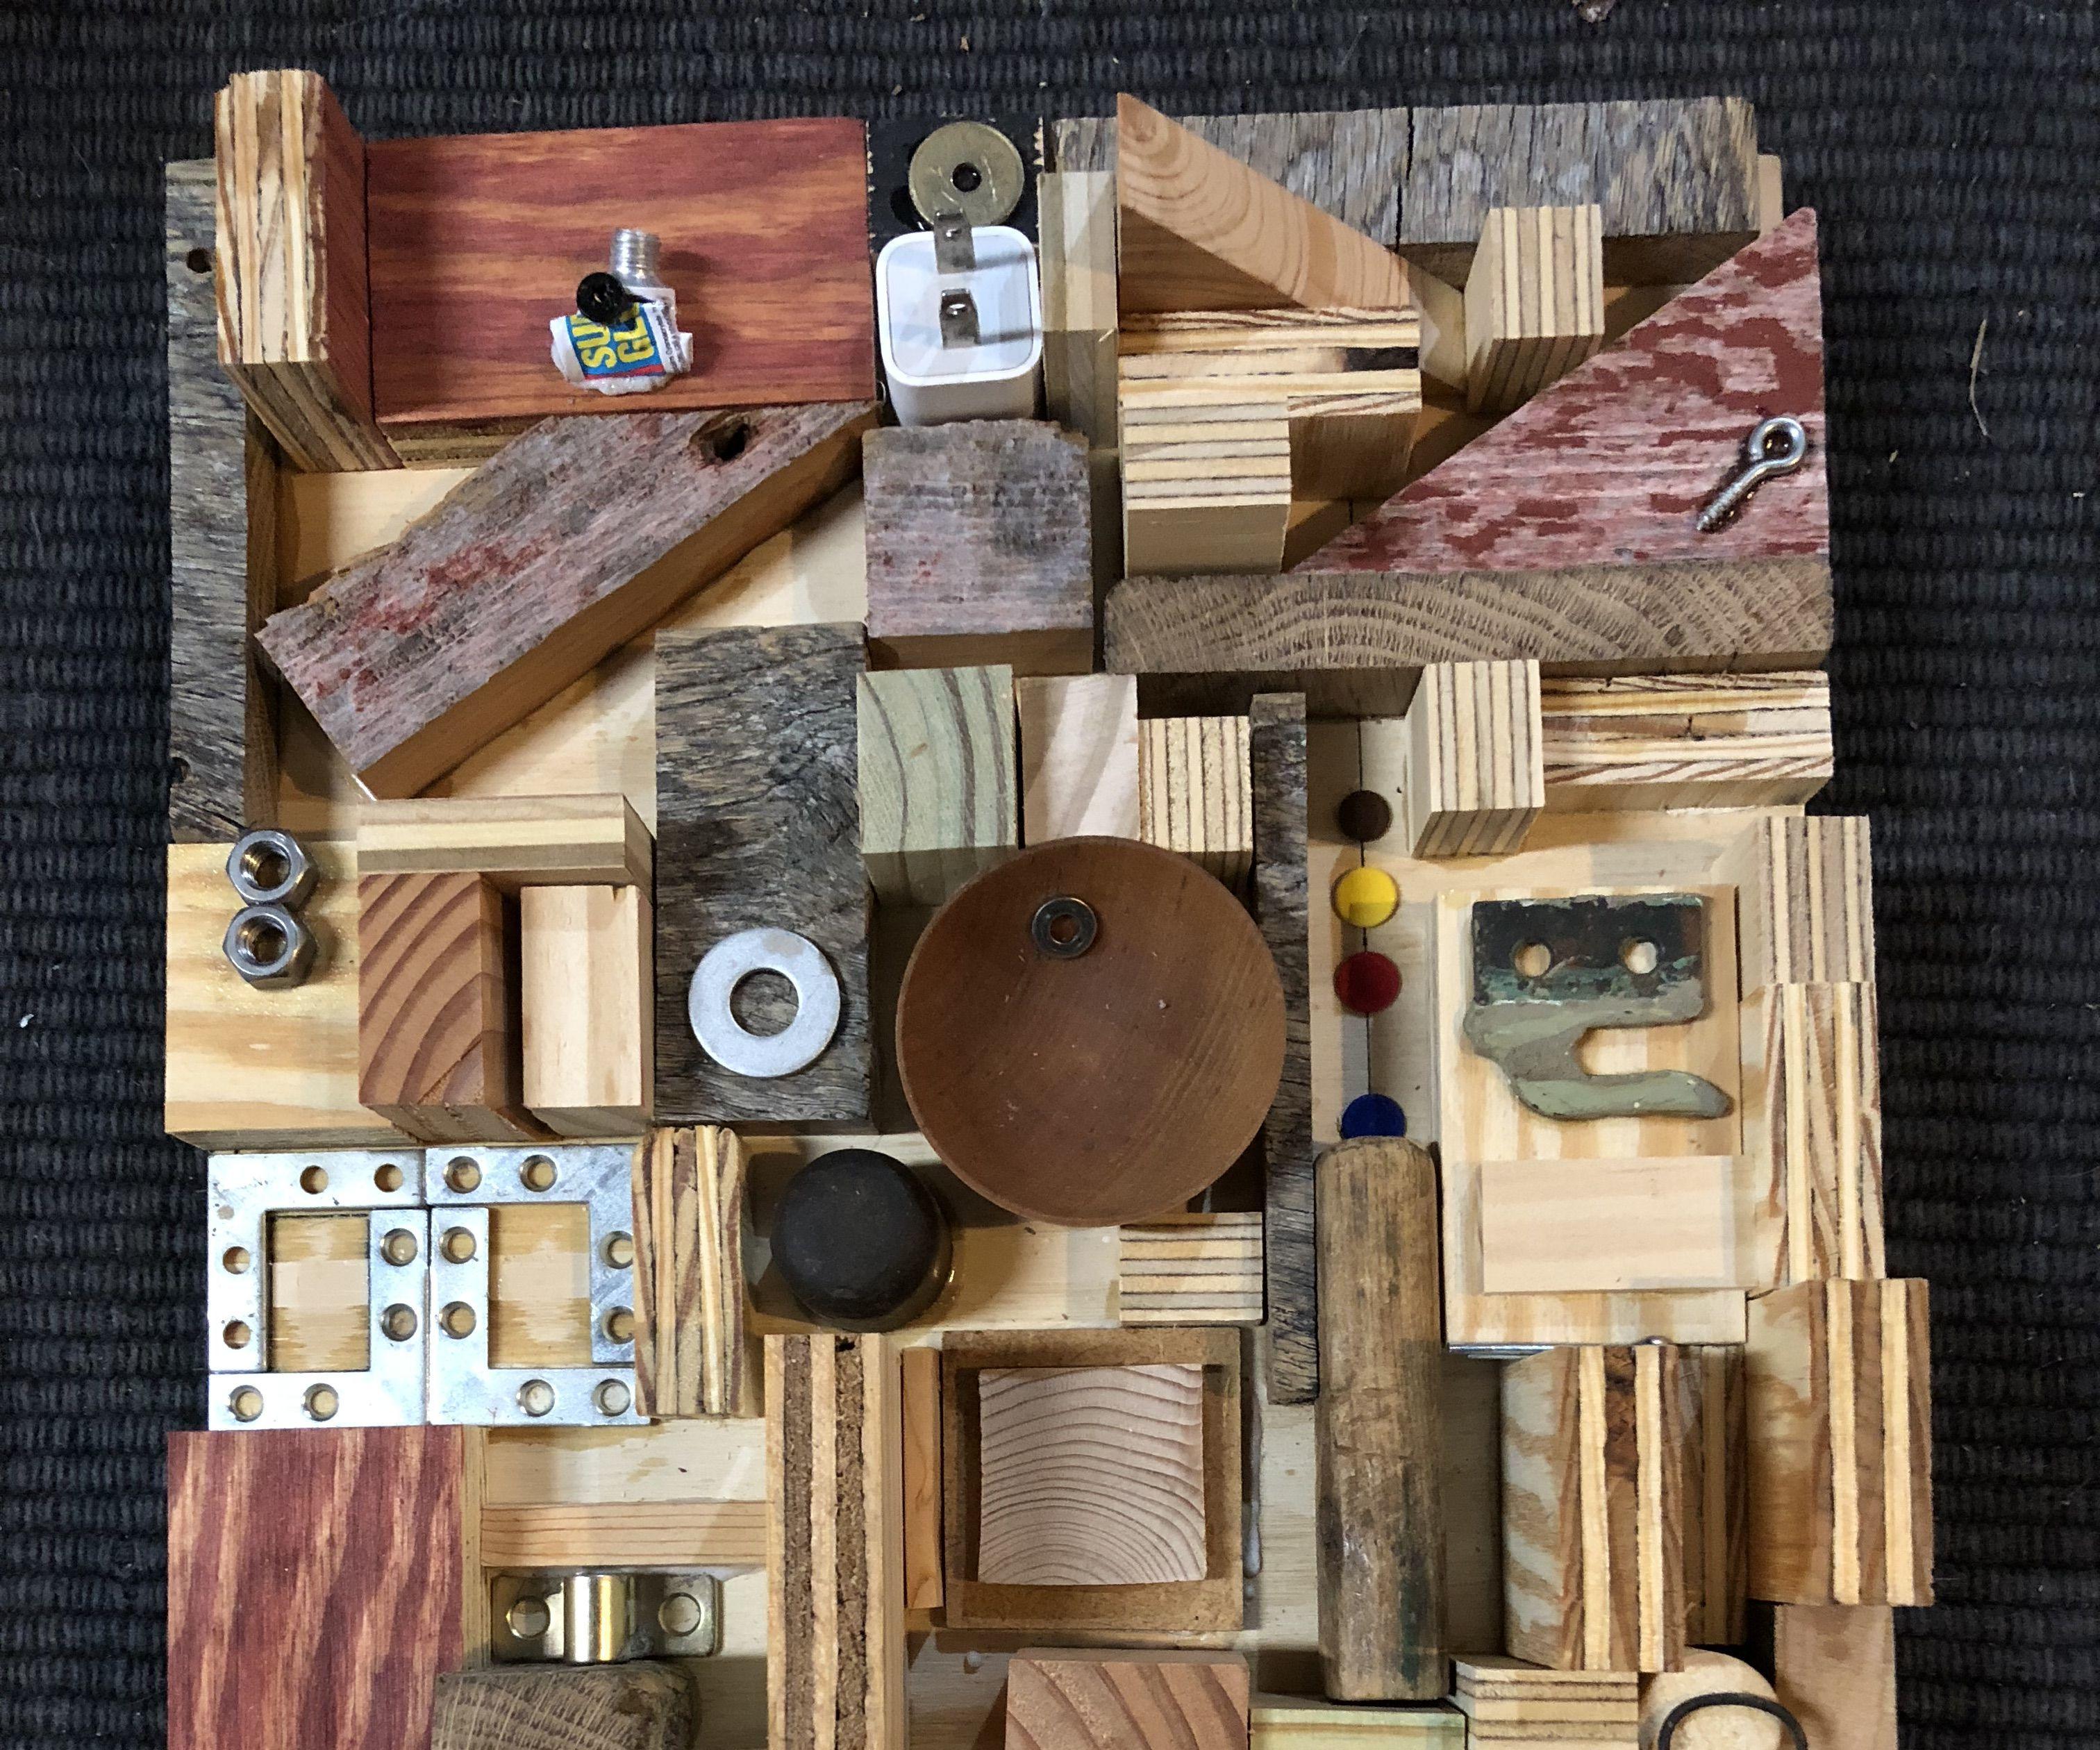 Random Found Items Glued to Plywood